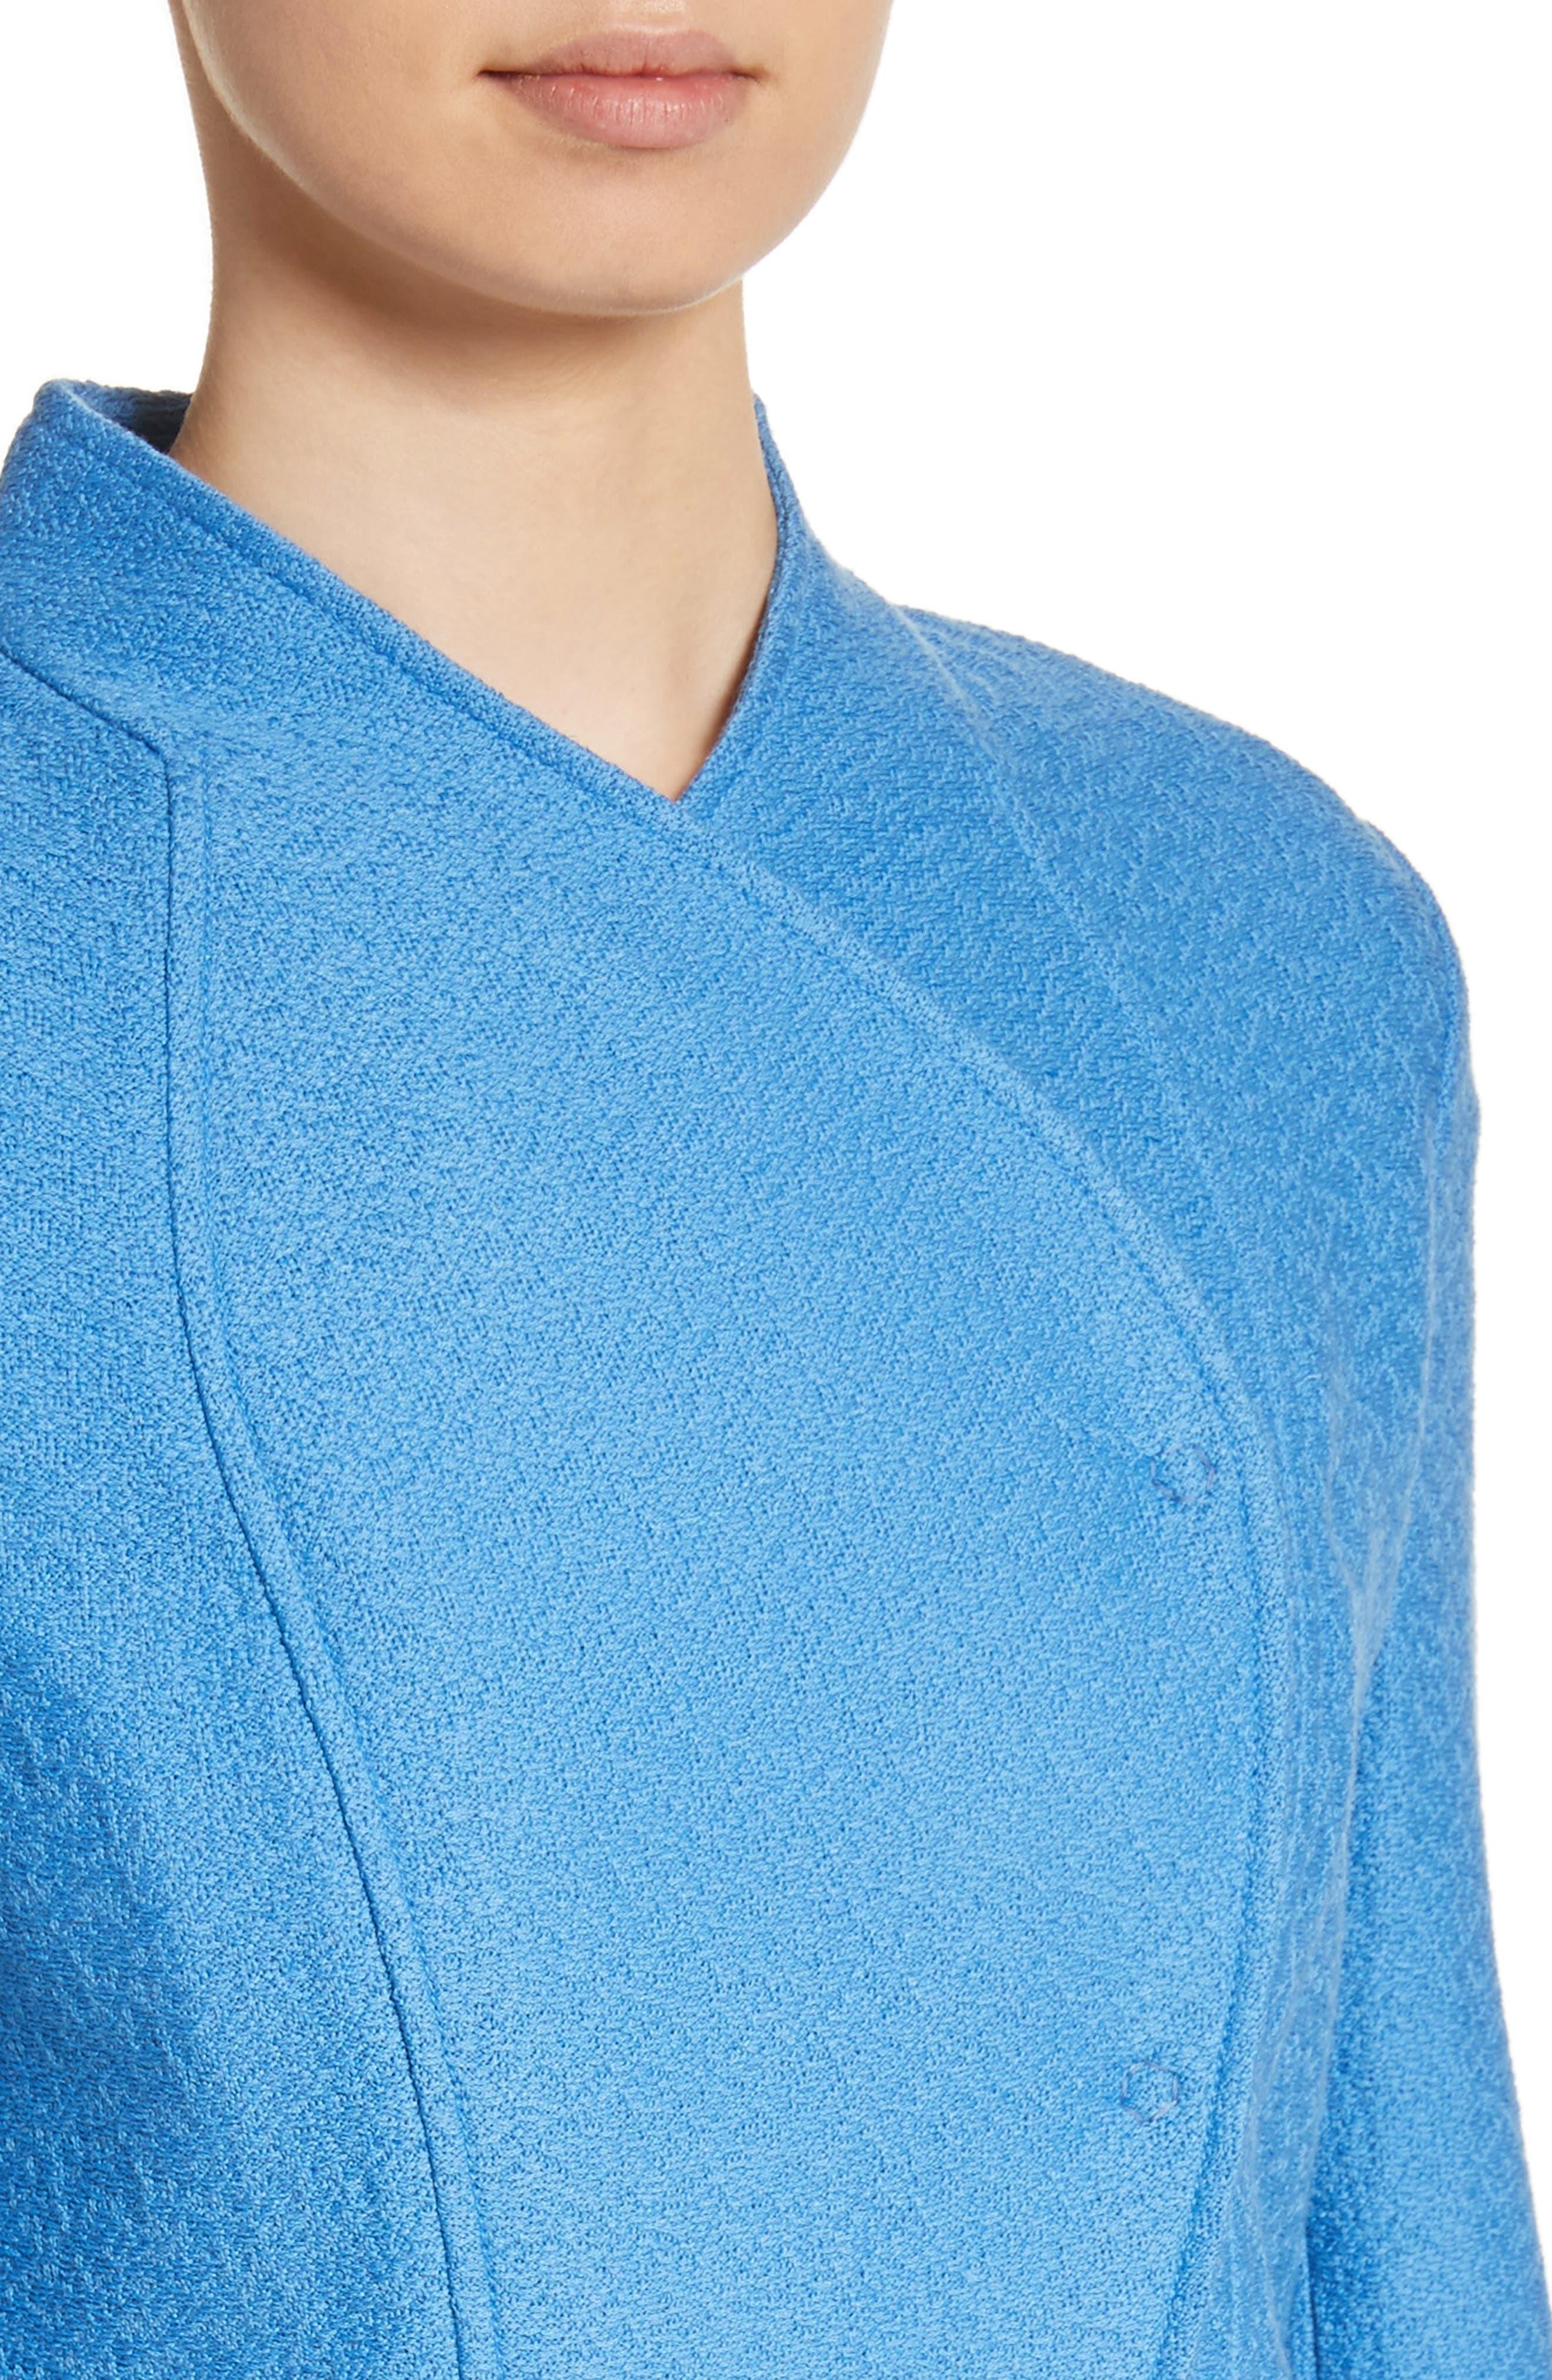 Hannah Knit Stand Collar Jacket,                             Alternate thumbnail 4, color,                             420